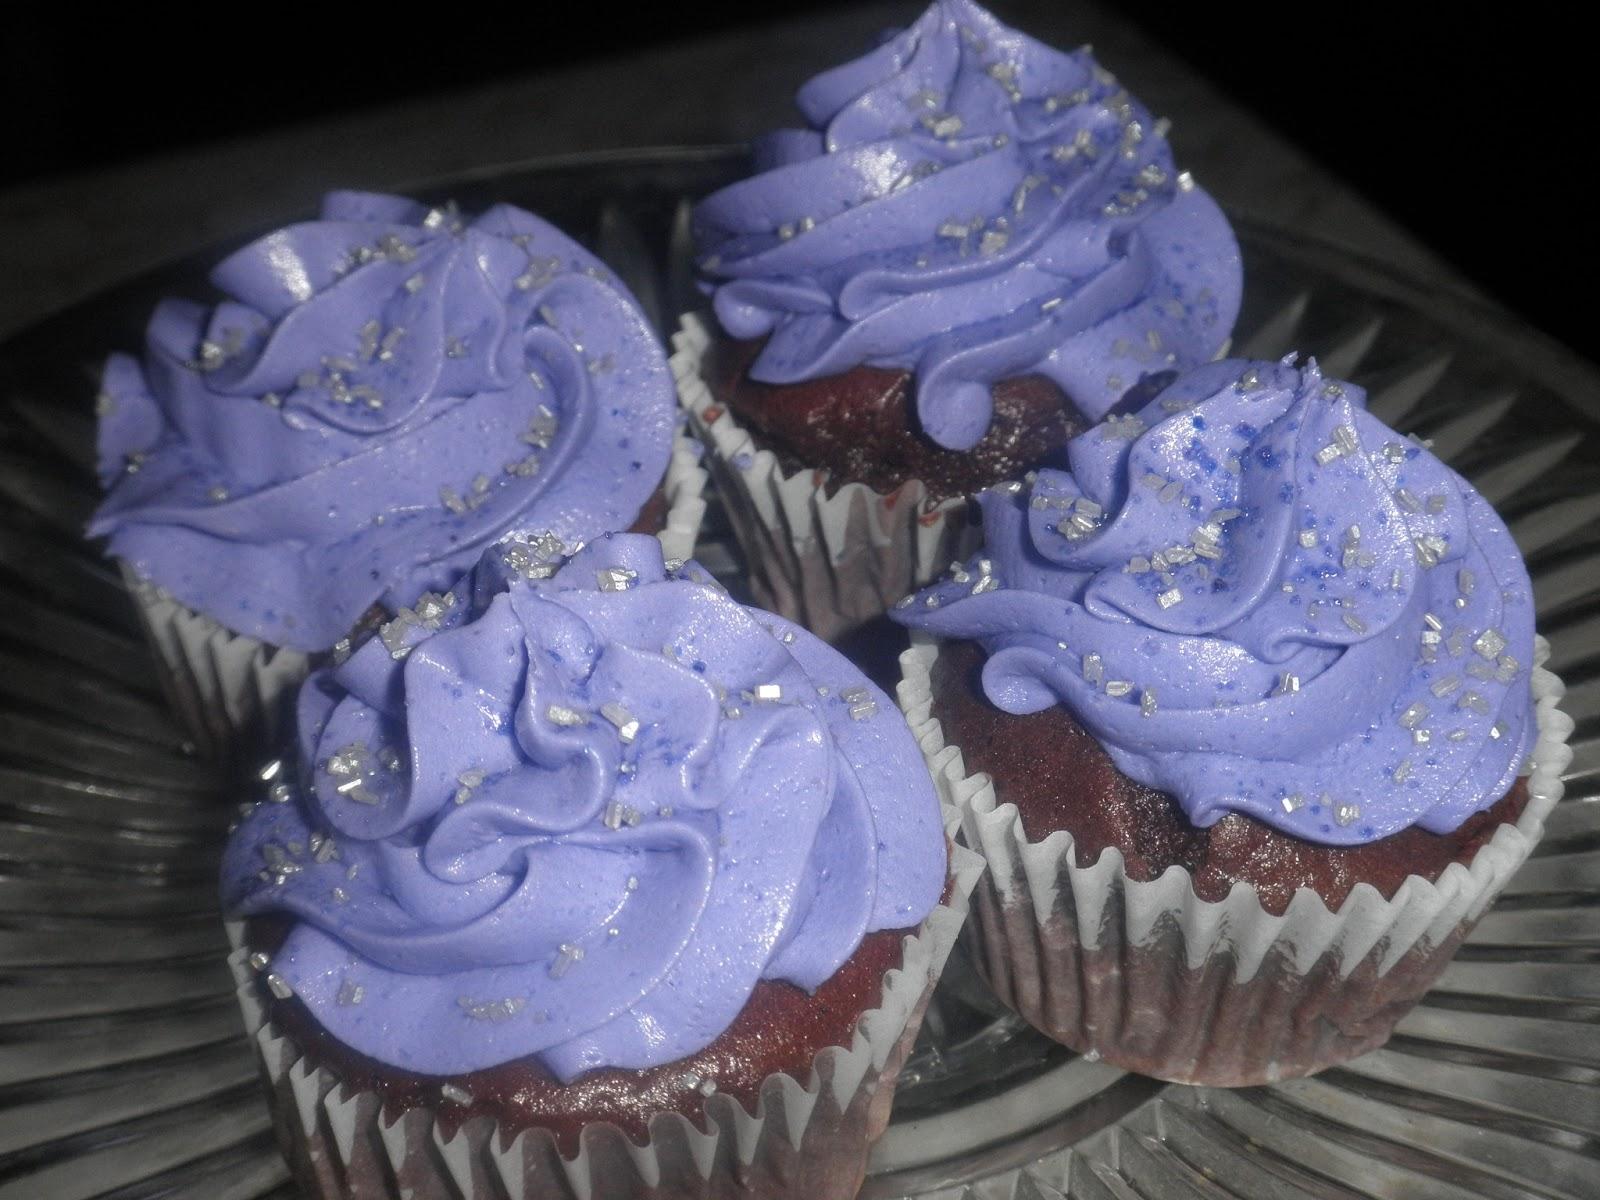 Edible Art Cake Glitter : MudArt & Cakes: DIY Edible Glitter